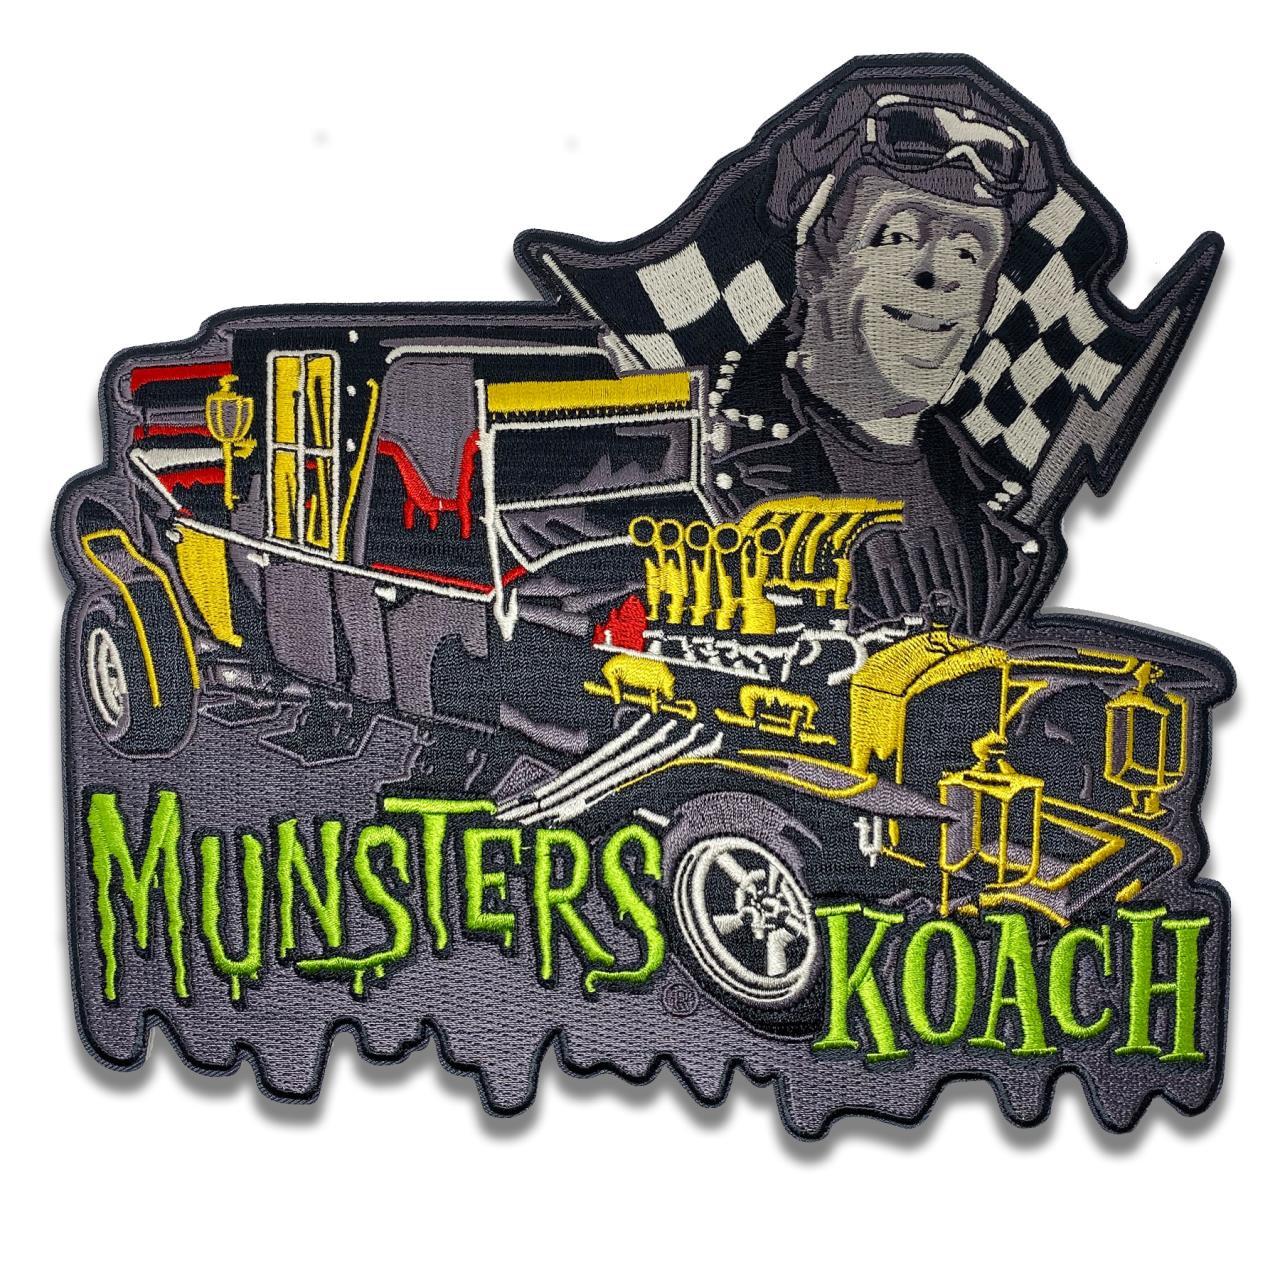 Munsters Koach Back Patch* - 0659682815534